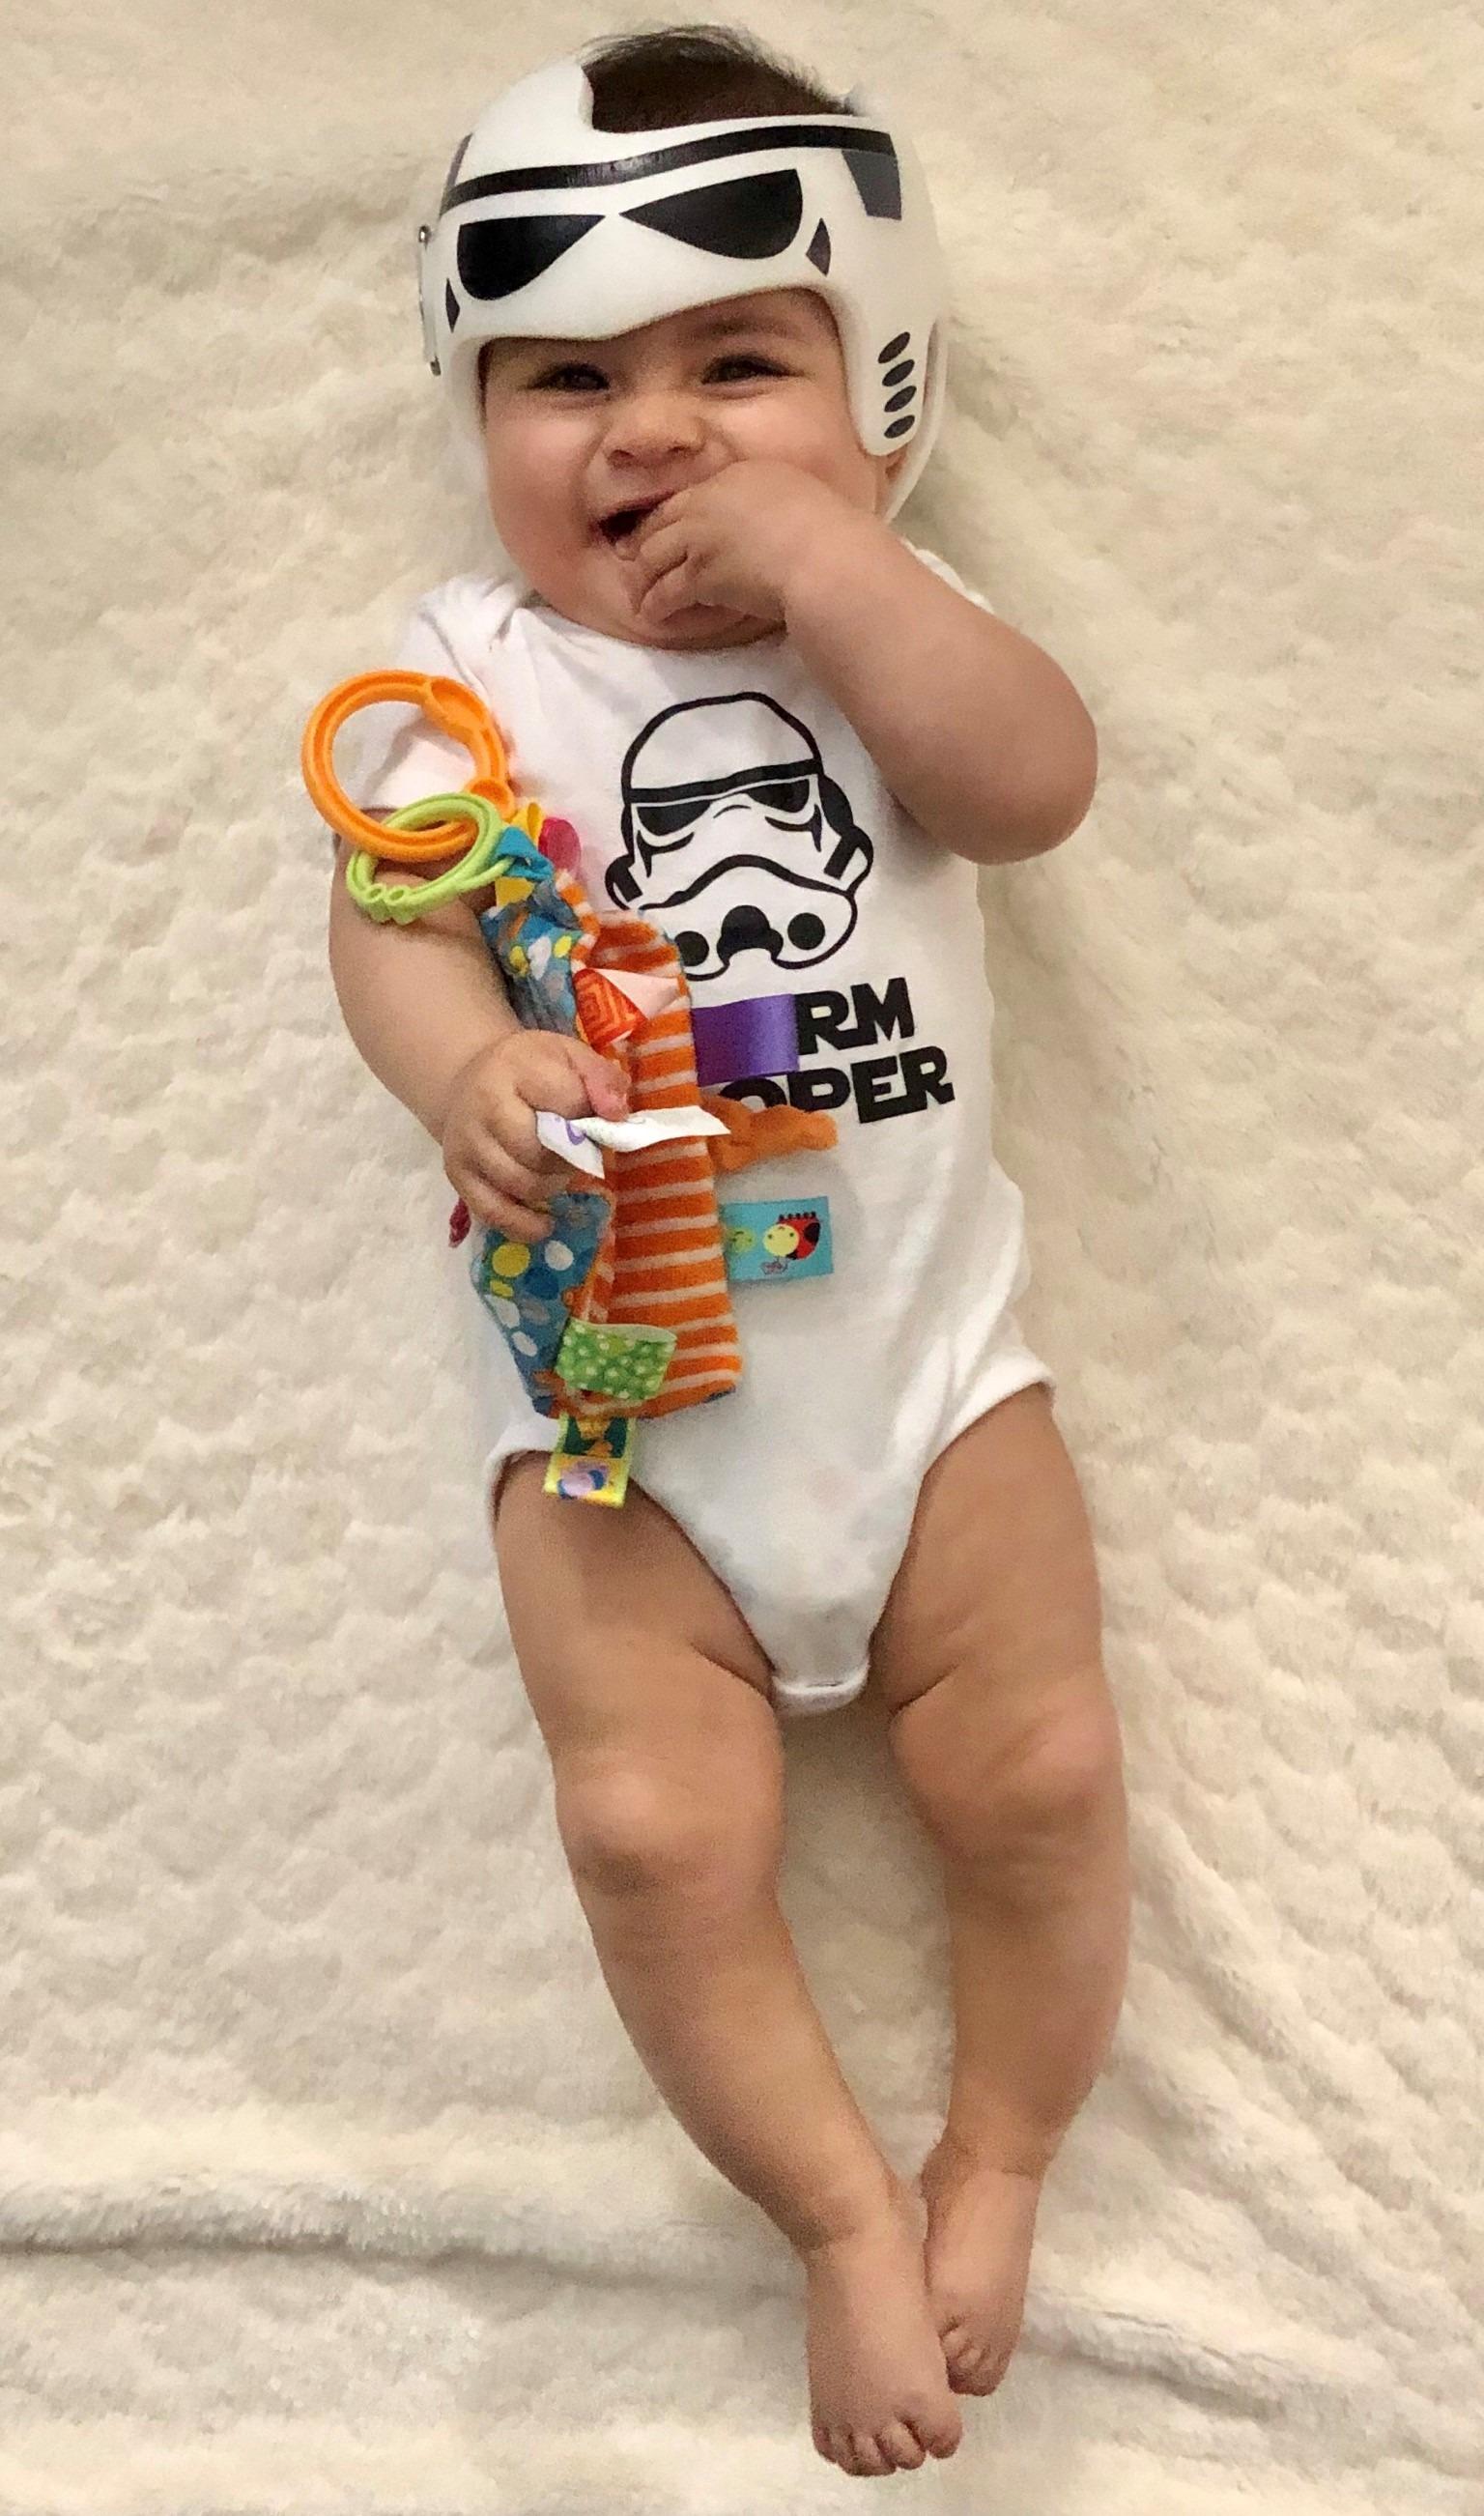 Storm Trooper star wars cranial band